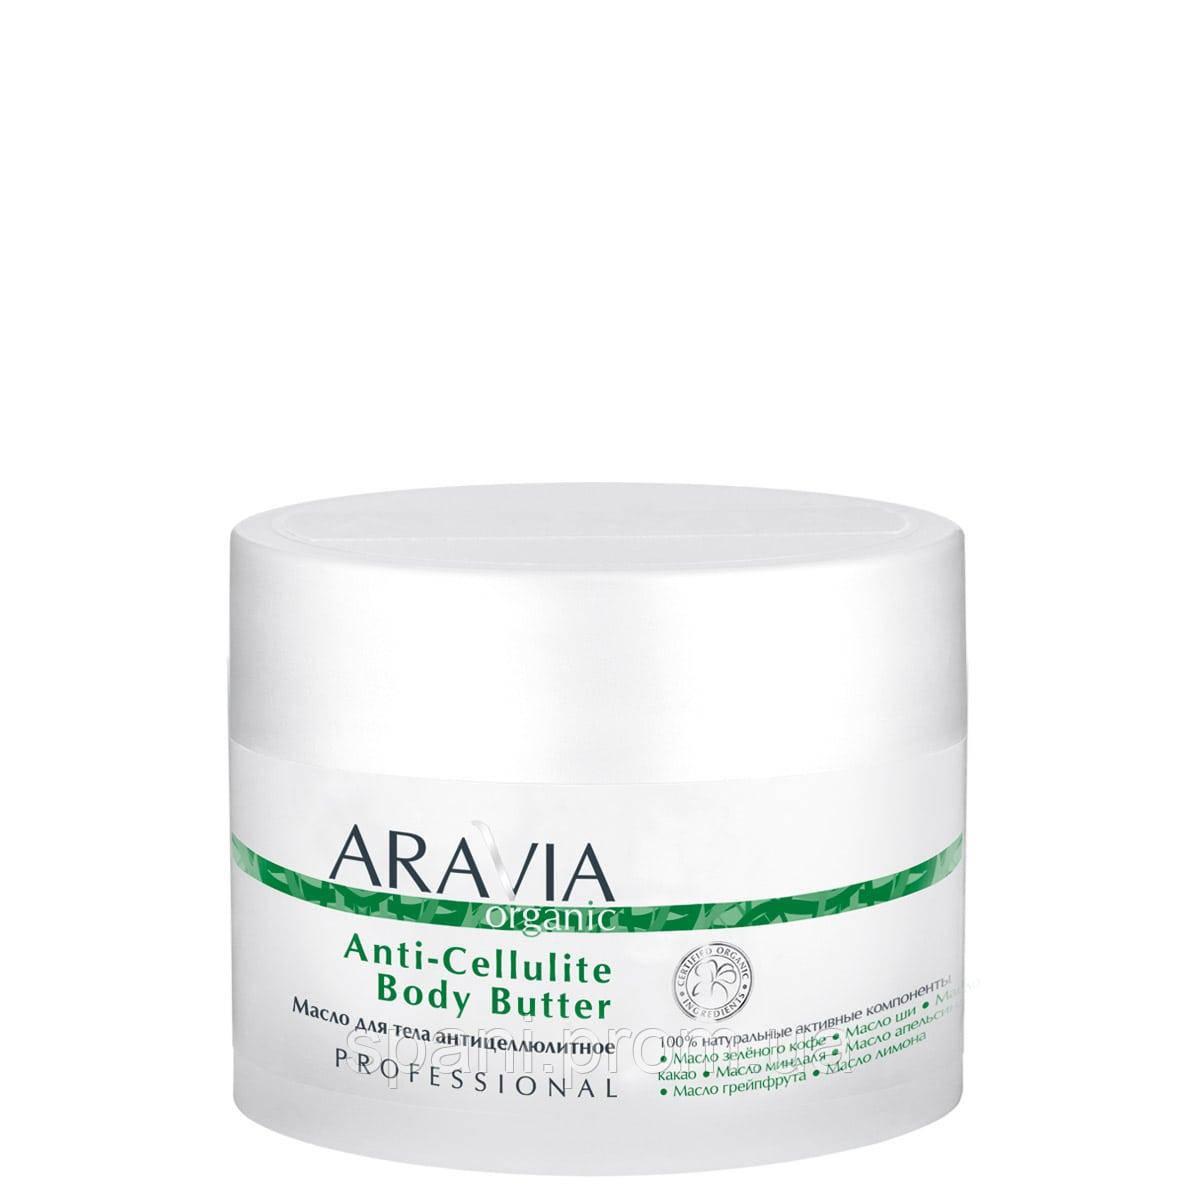 """ARAVIA Organic"" Масло для тіла антицелюлітний Anti-Cellulite Body Butter, 150 мл."